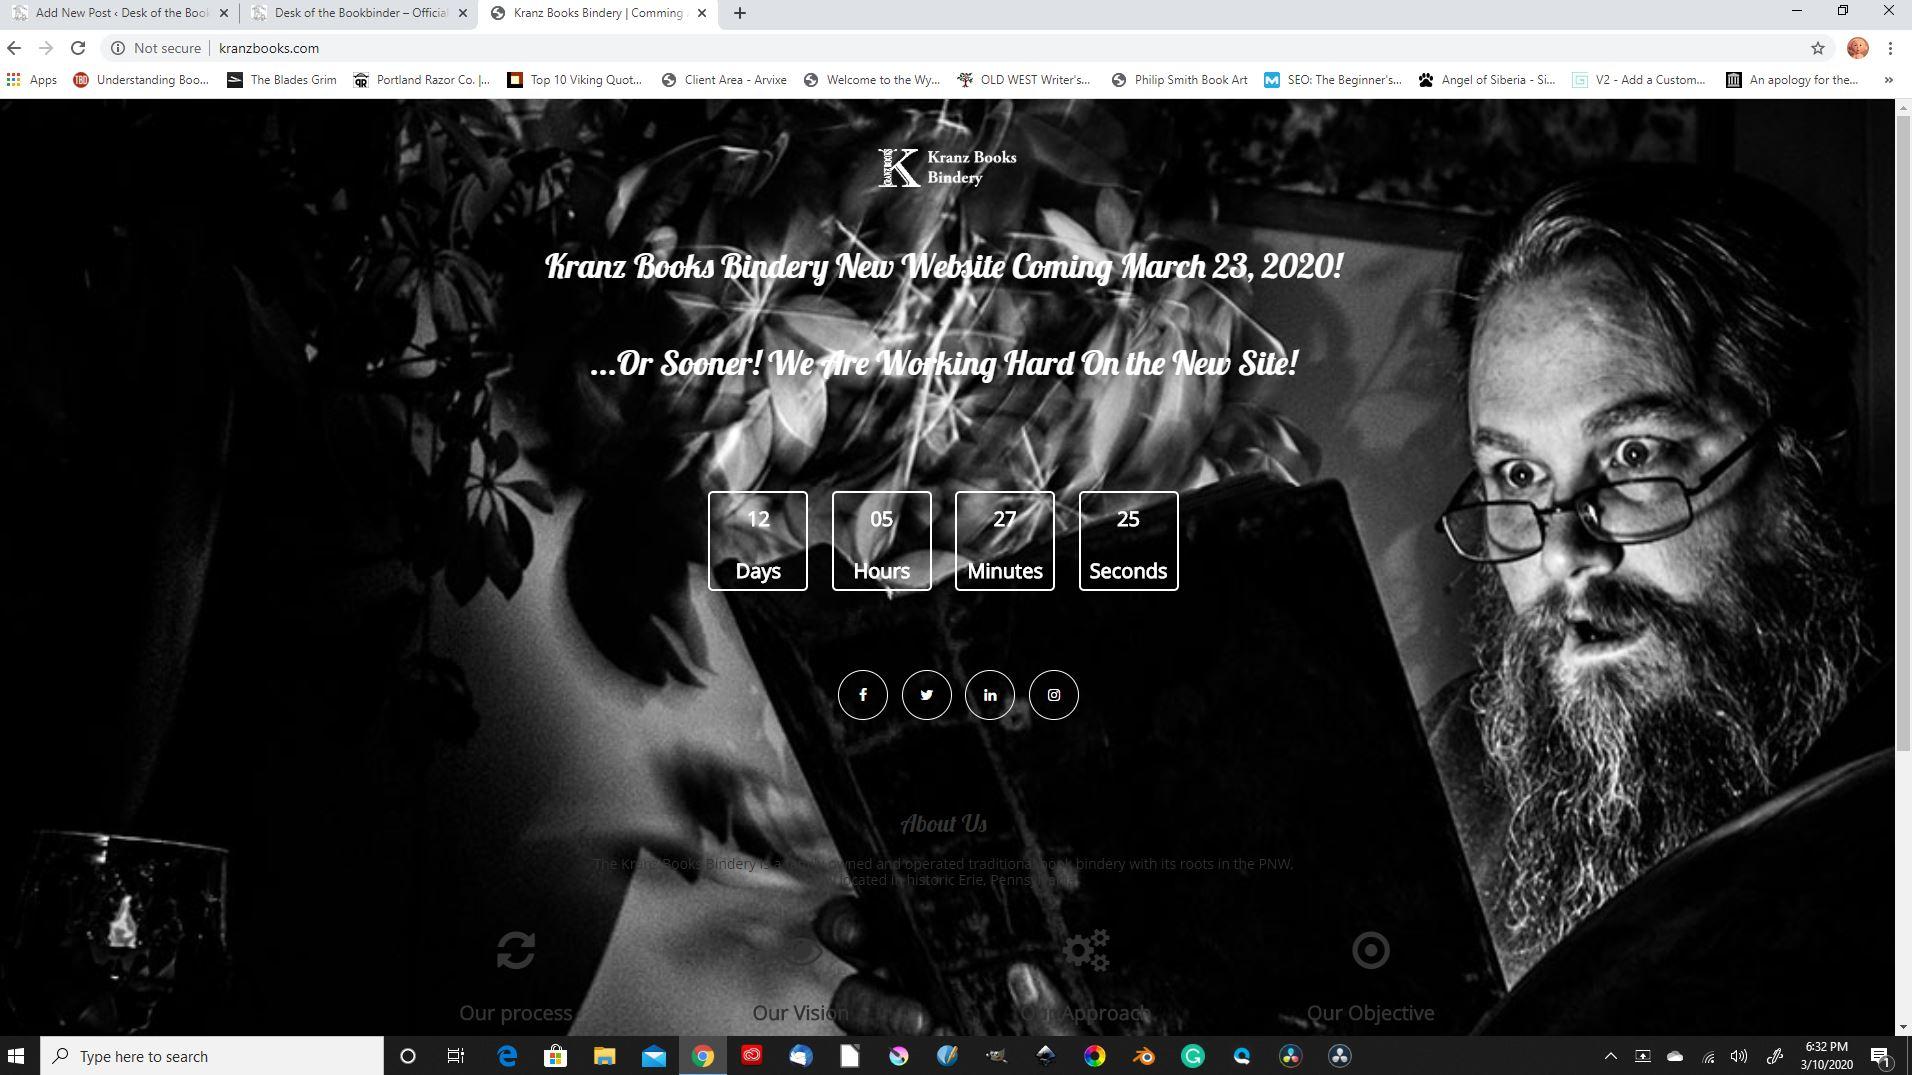 Website Countdown Image